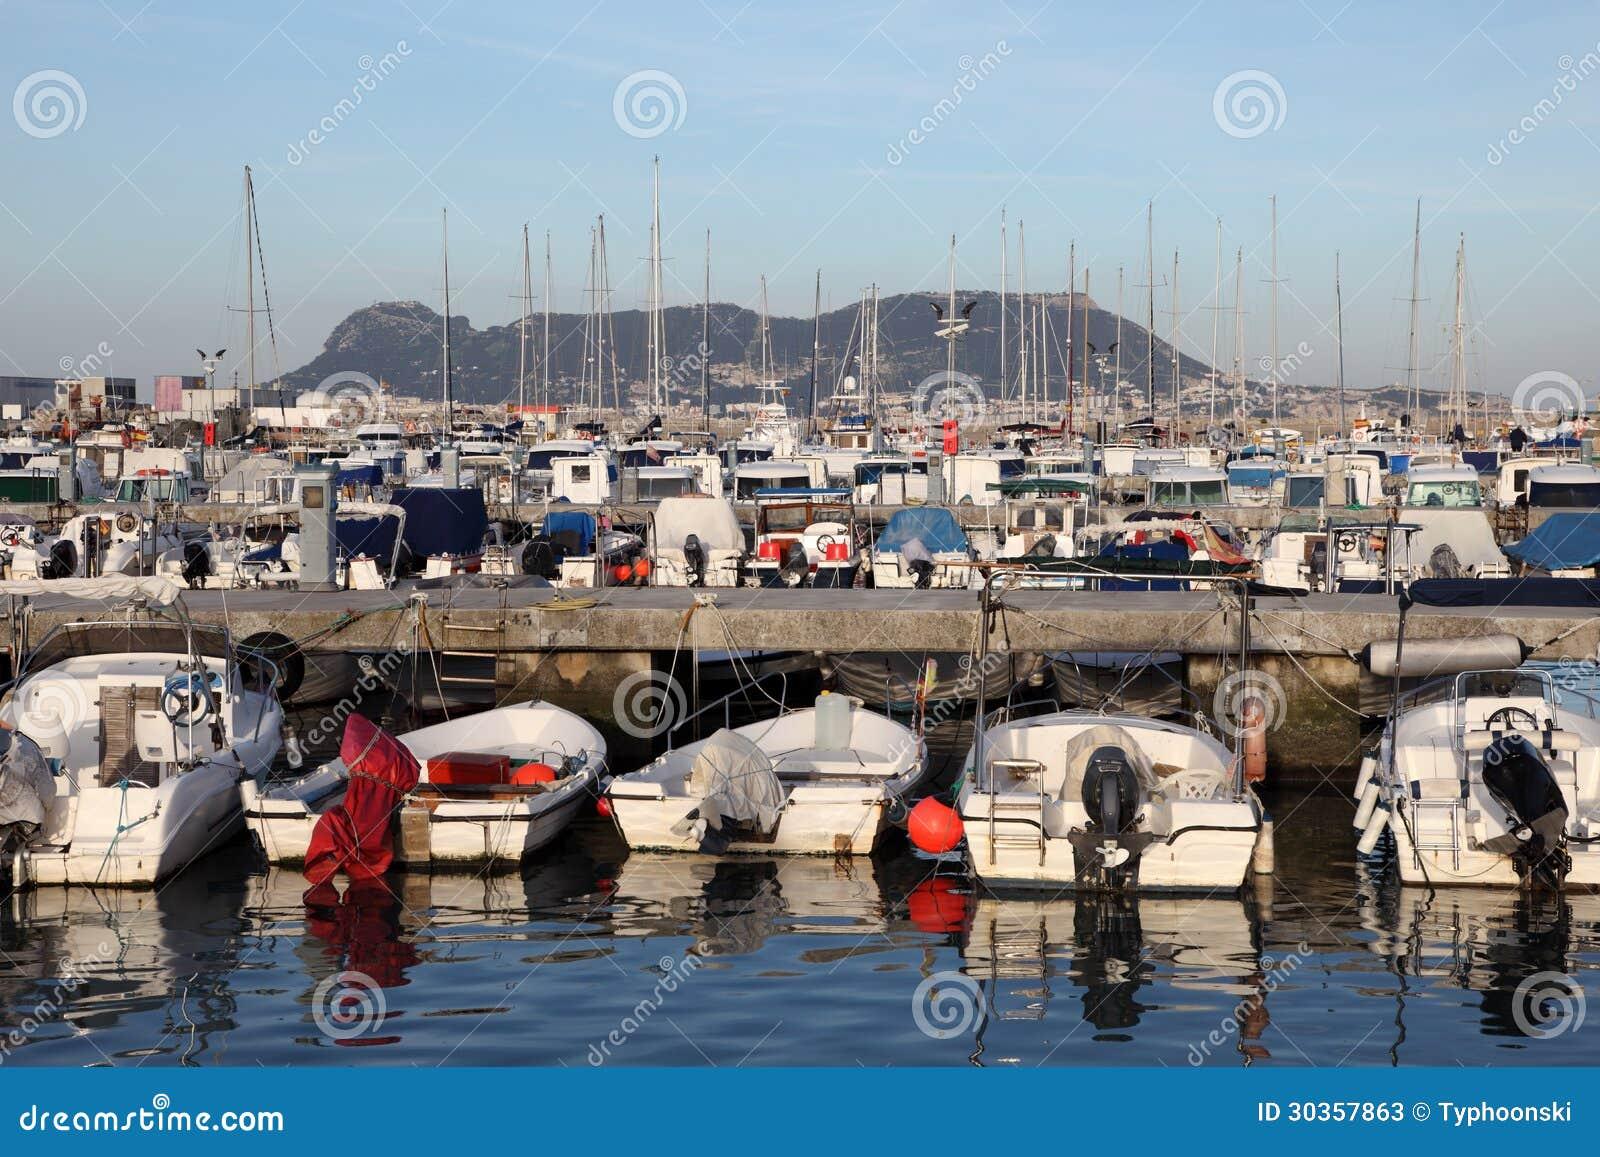 Travel From Algeciras To Gibraltar Car